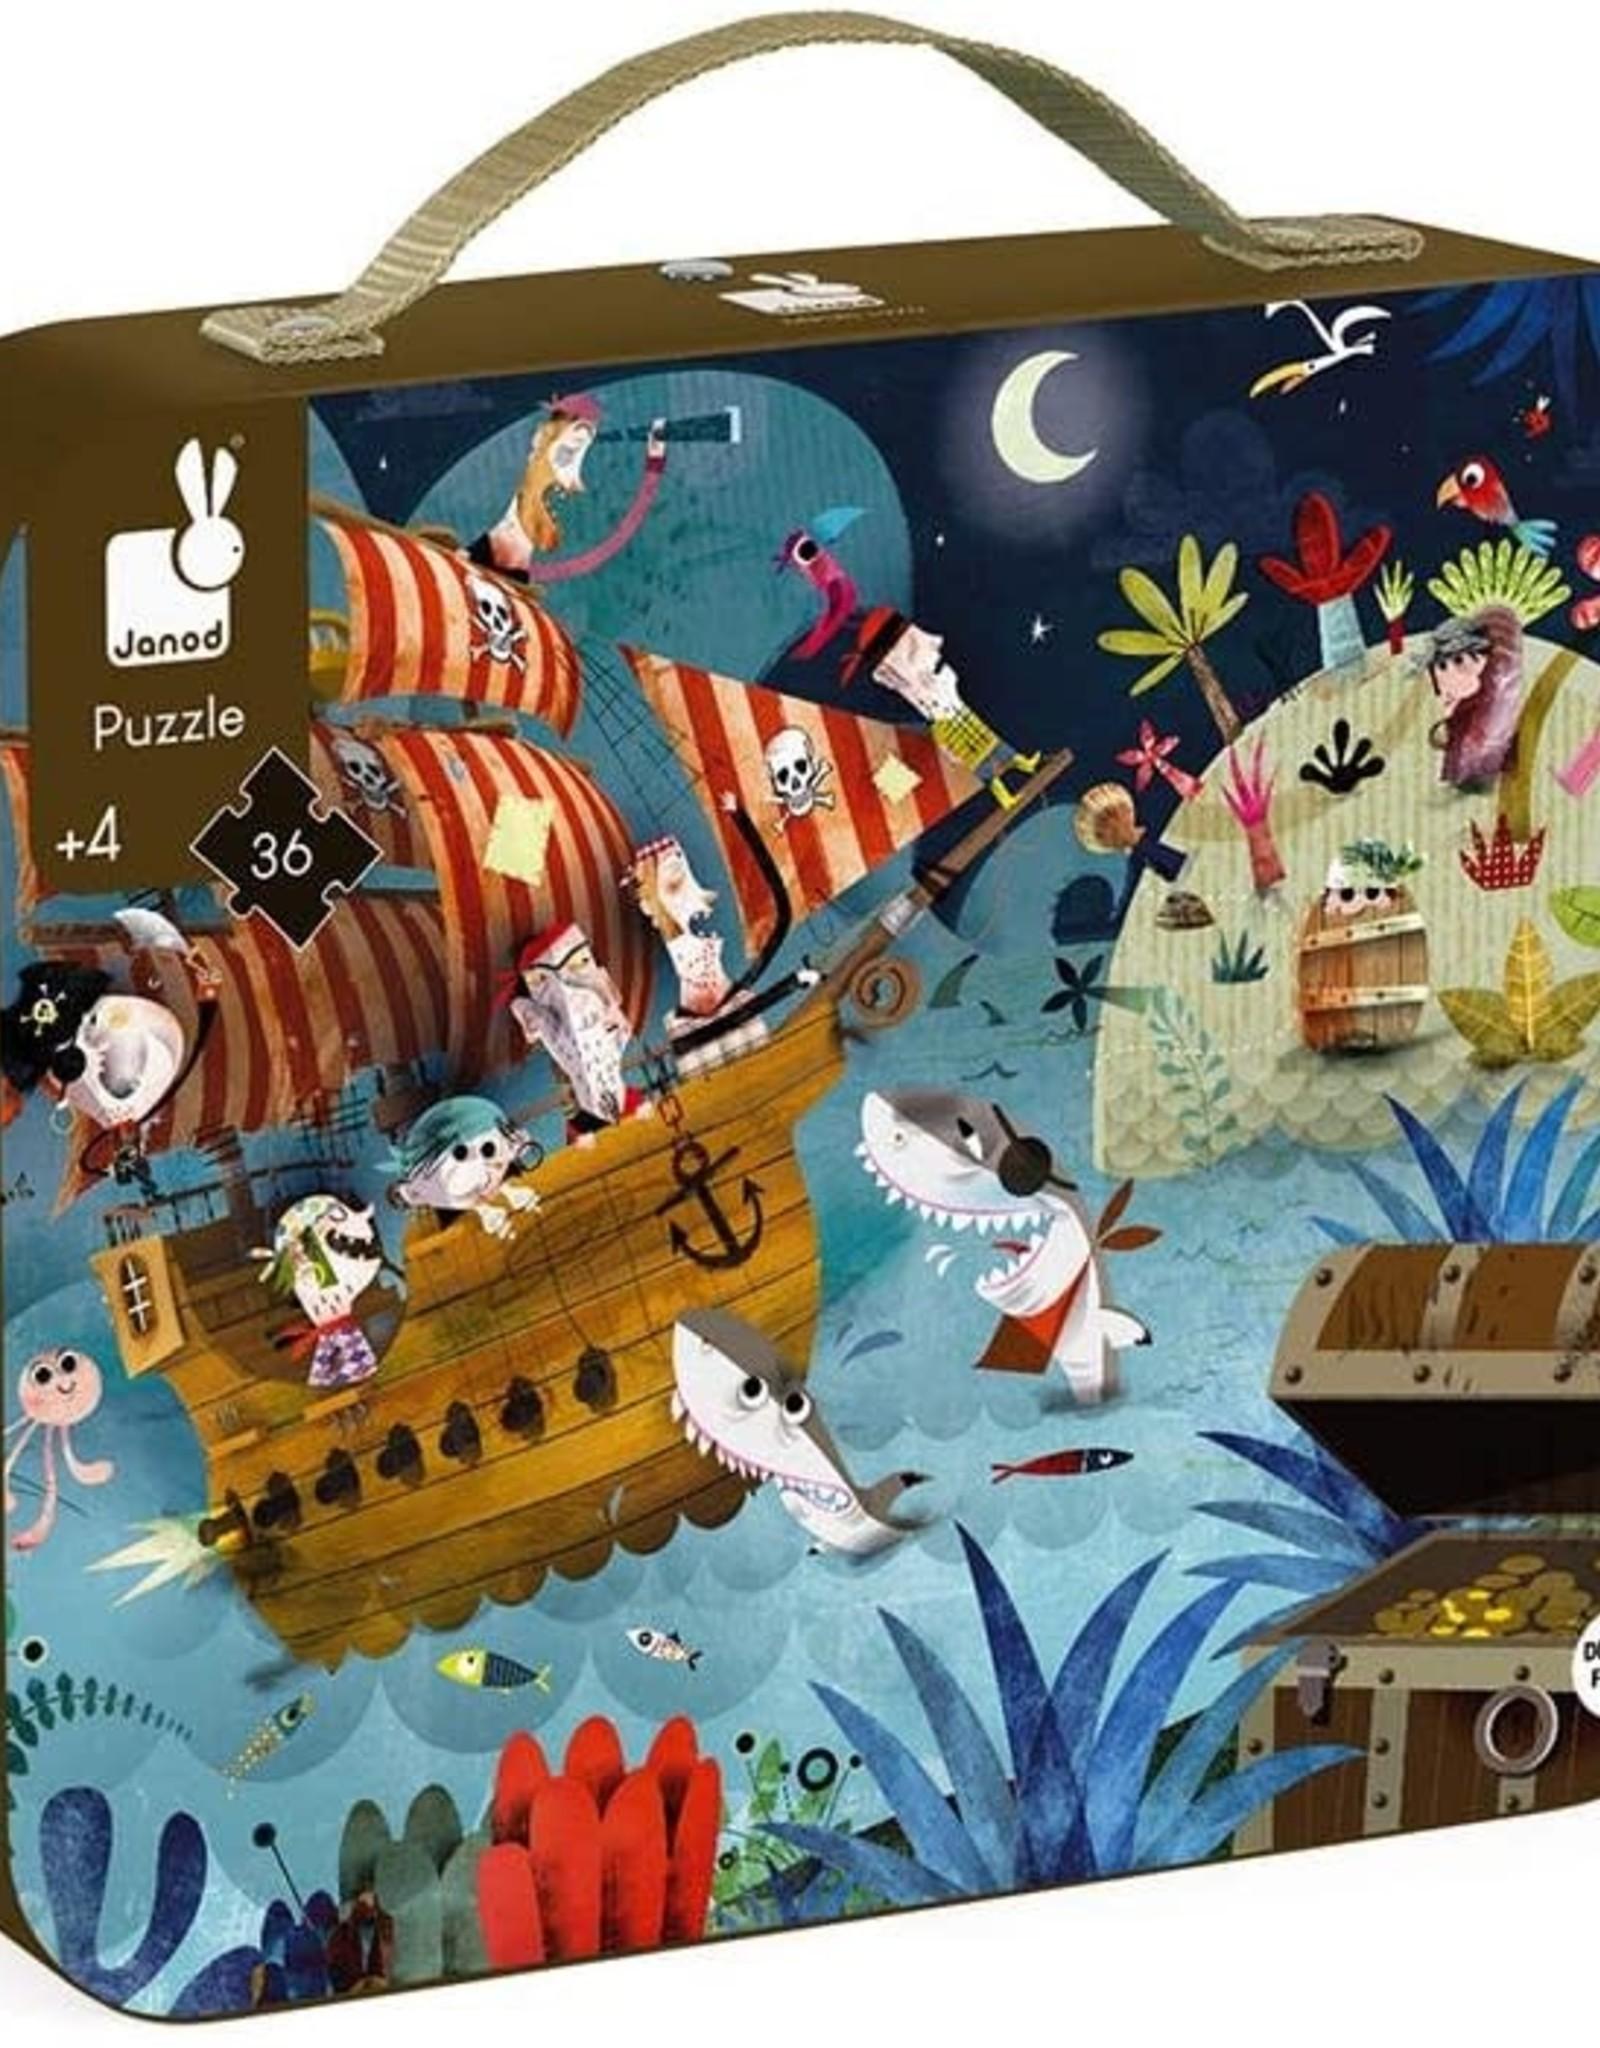 Janod Treasure Hunt - 36 pc puzzle by Janod